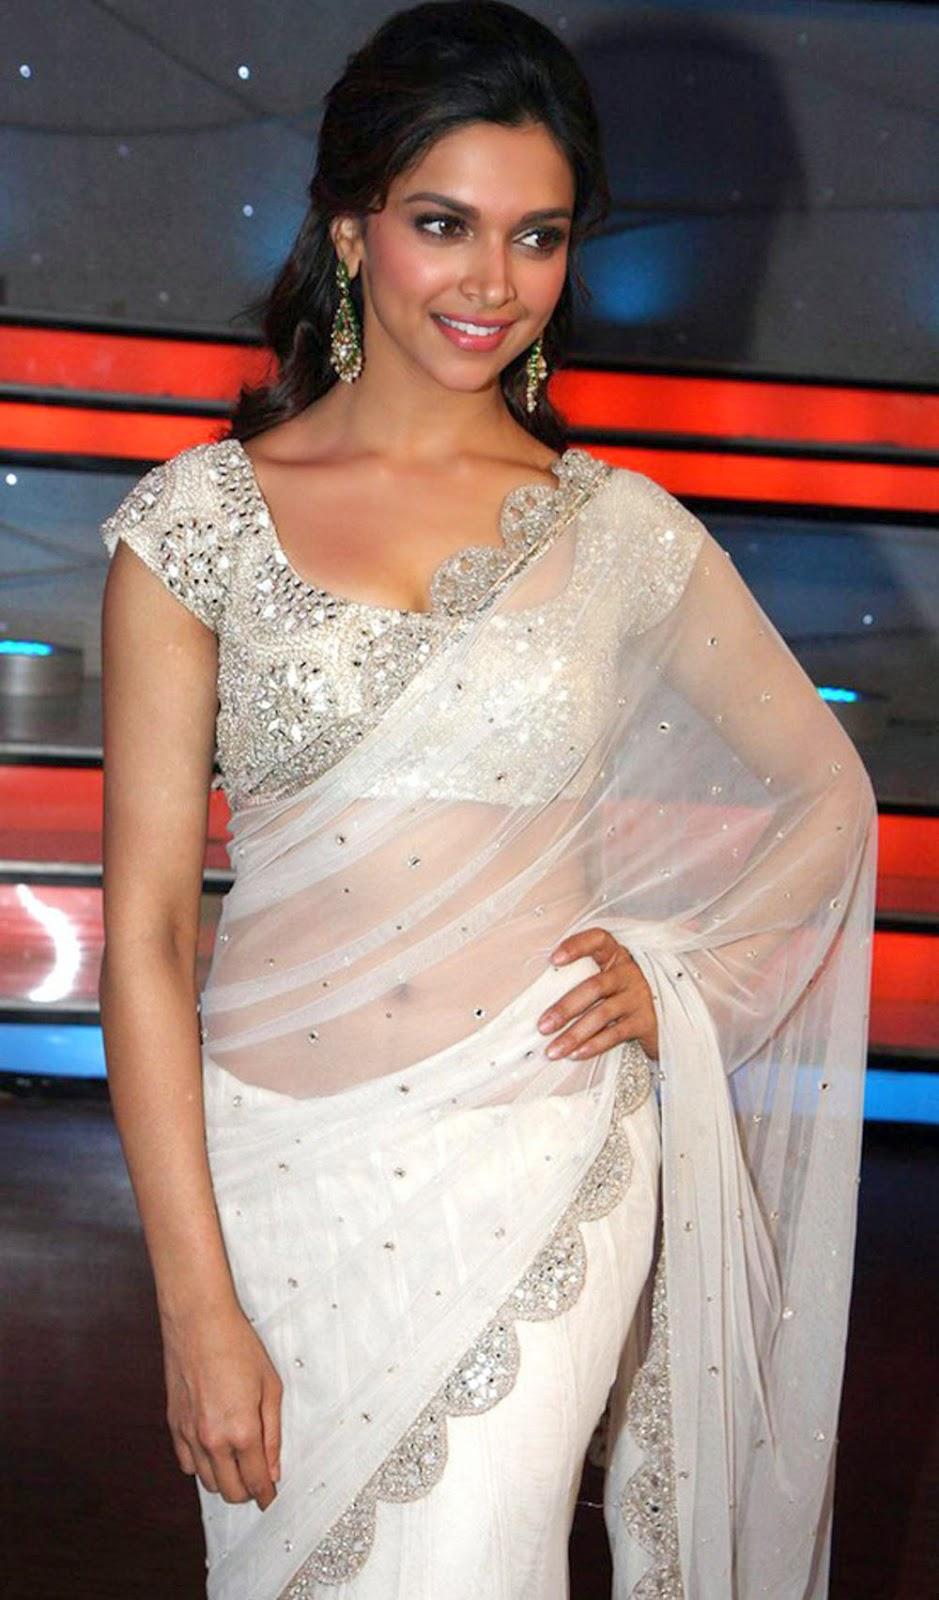 Deepika Padukone Hot Cleavage and Navel Photos in Saree ...